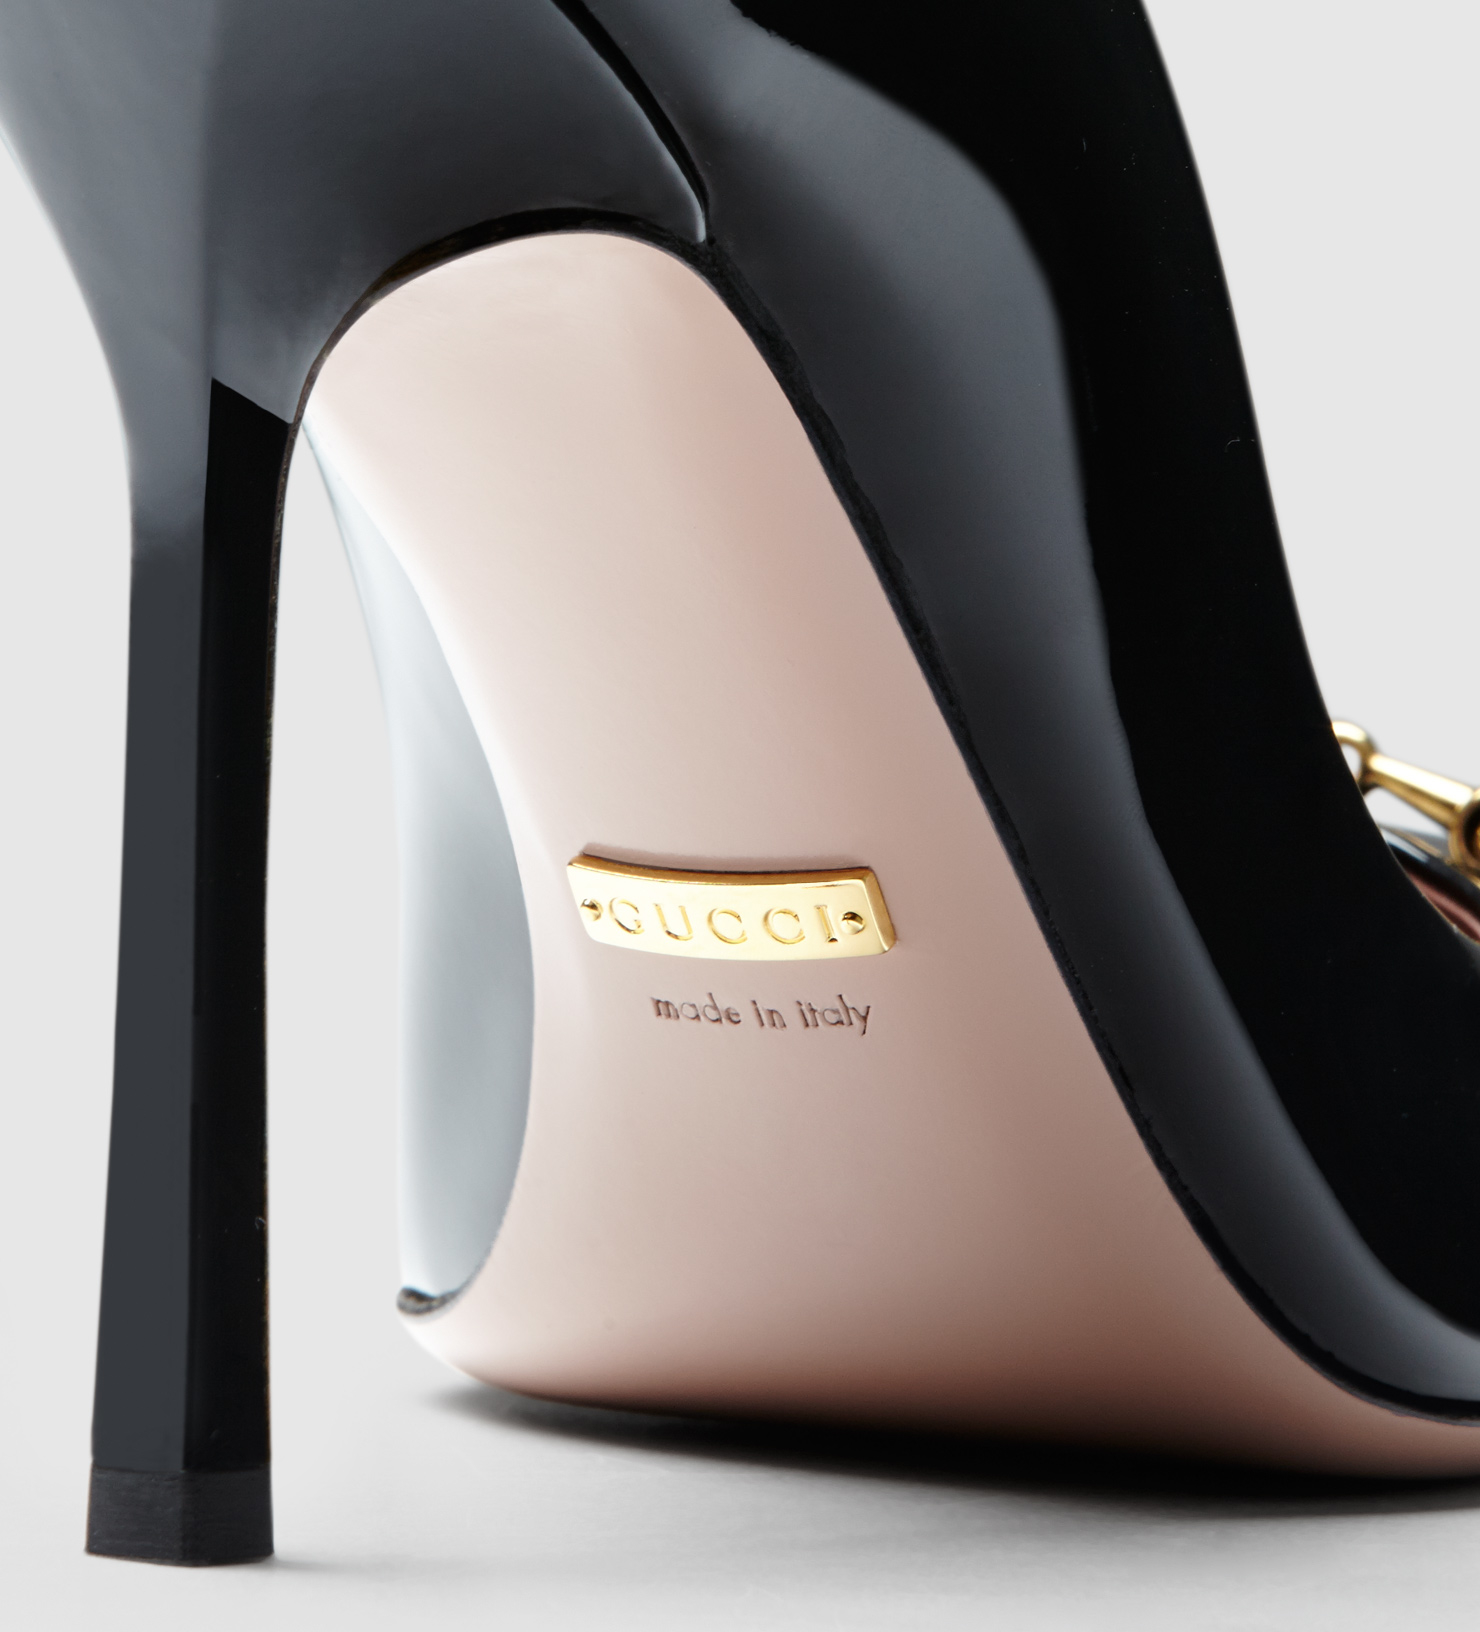 ace4d05eec1 Gucci Jolene Black Patent Leather Pump in Black - Lyst